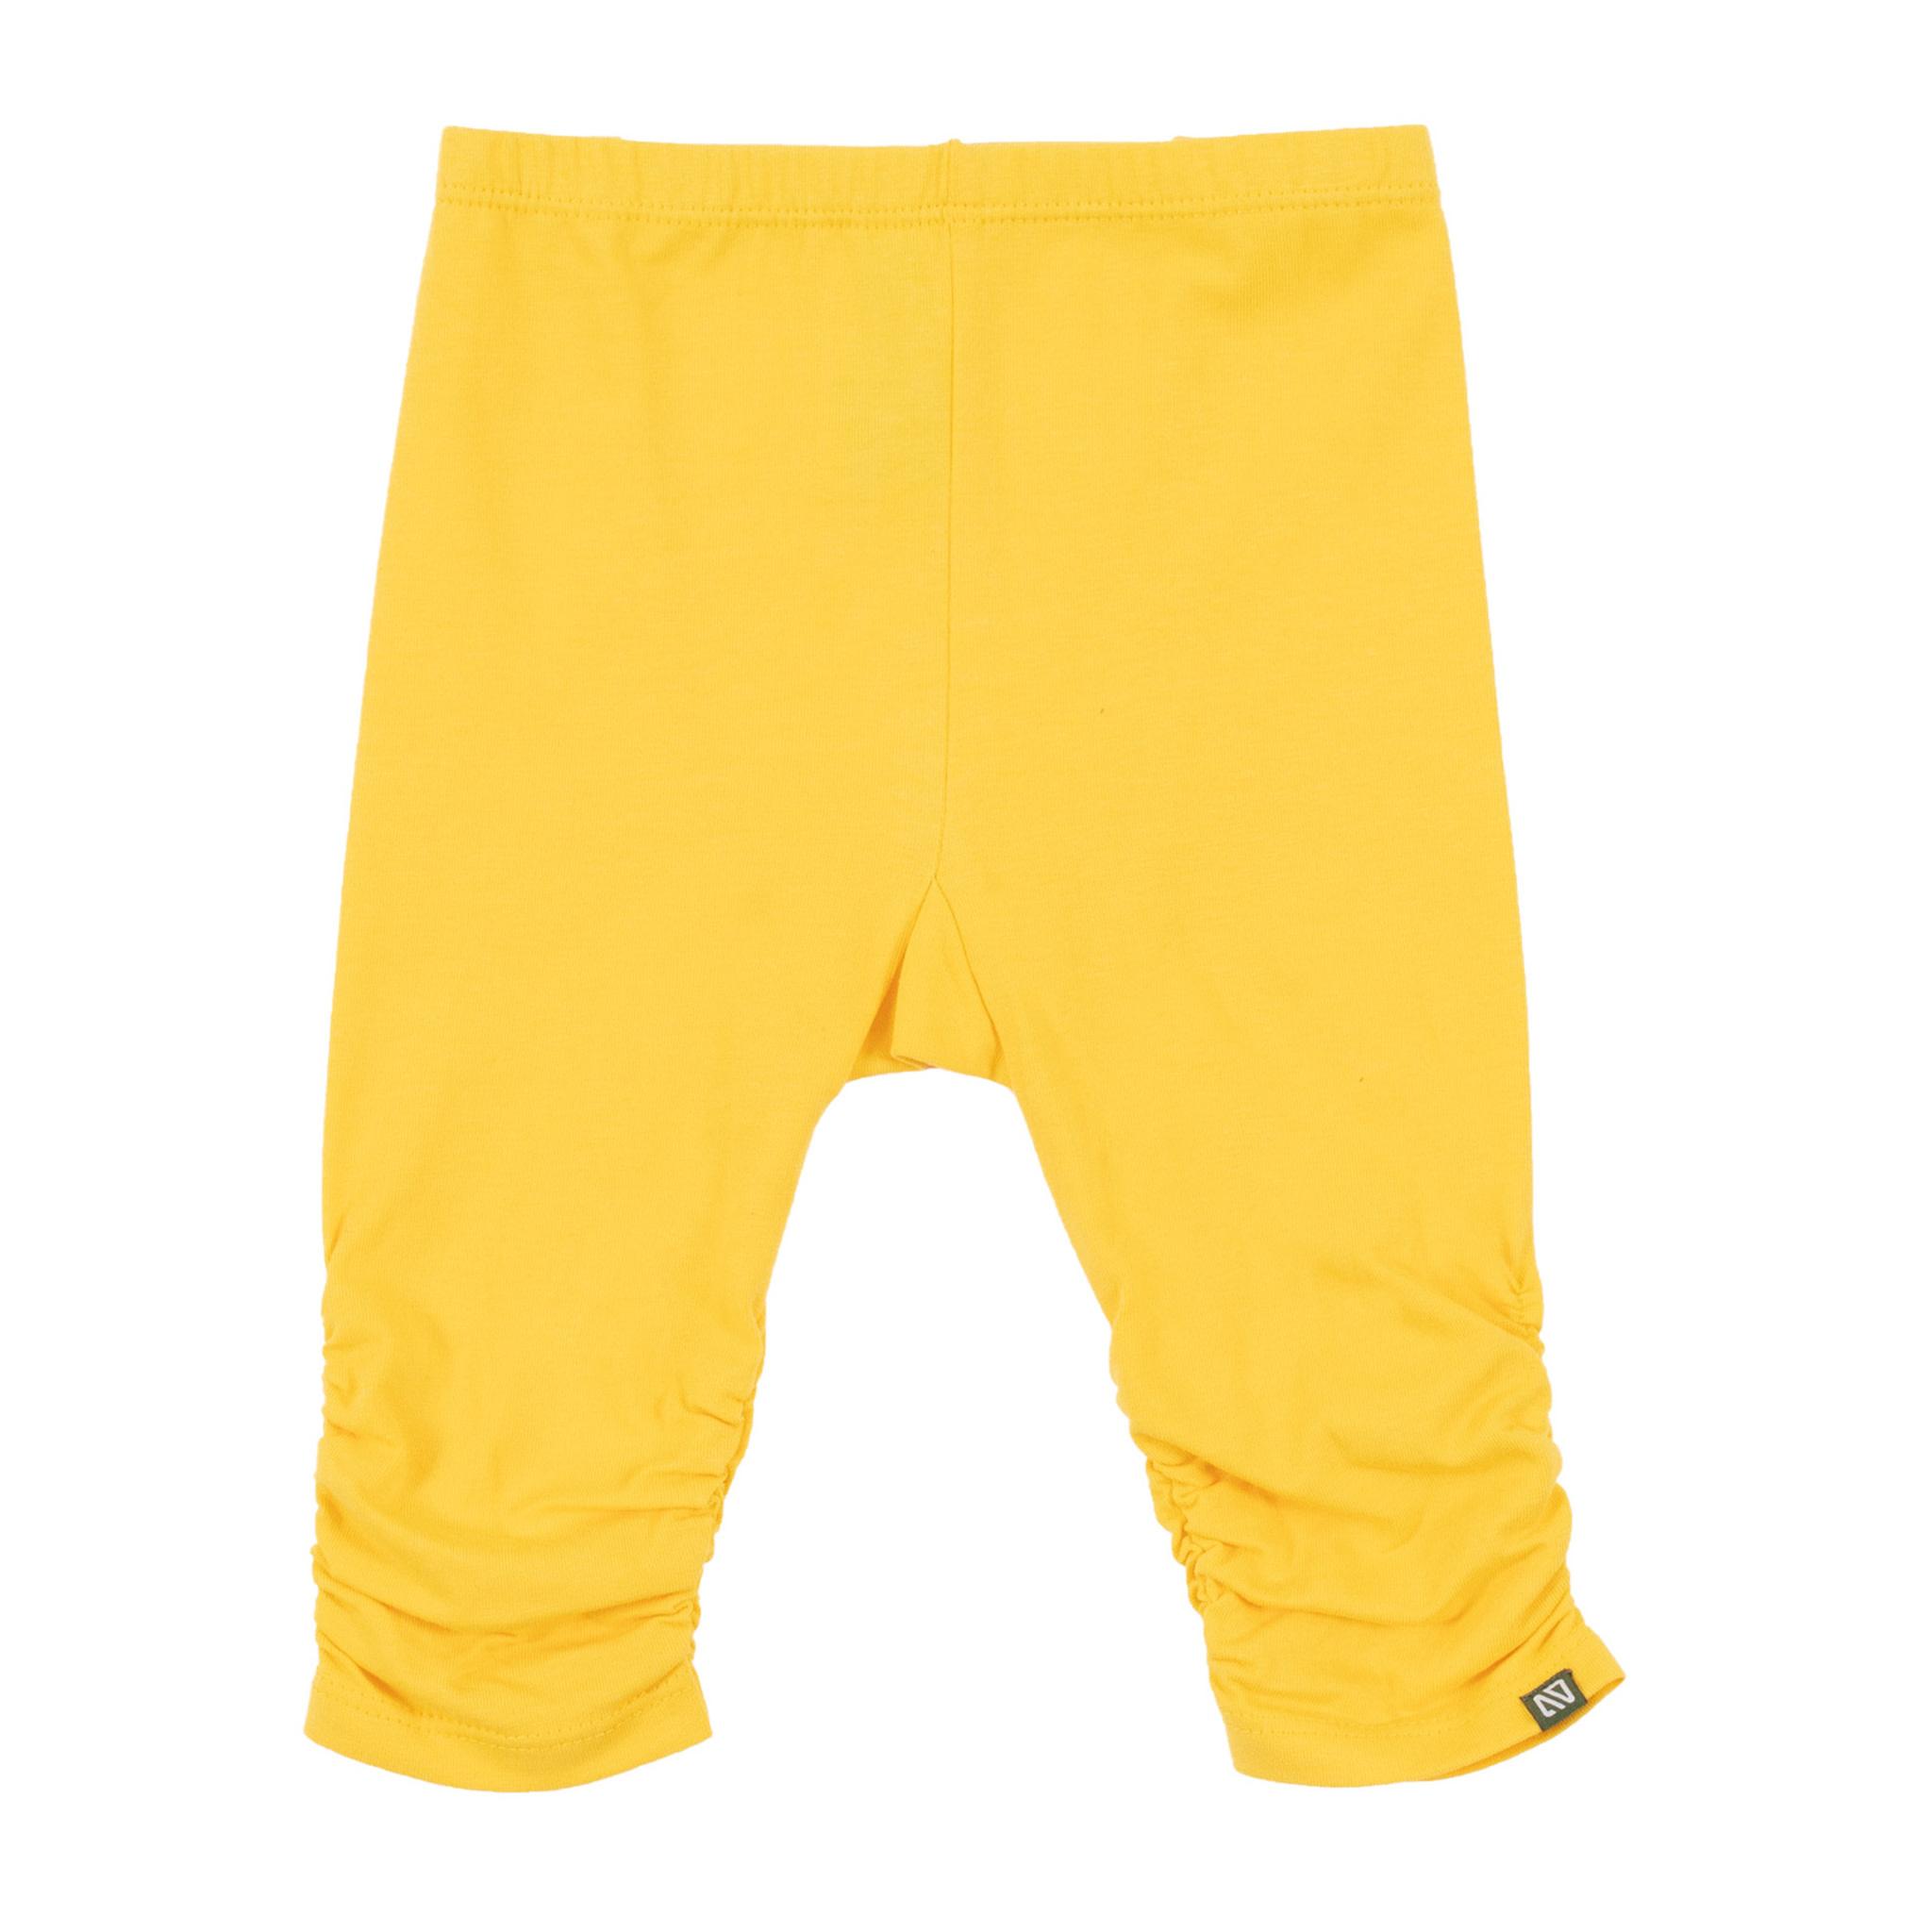 Legging 3/4 jaune Rayon de soleil-1